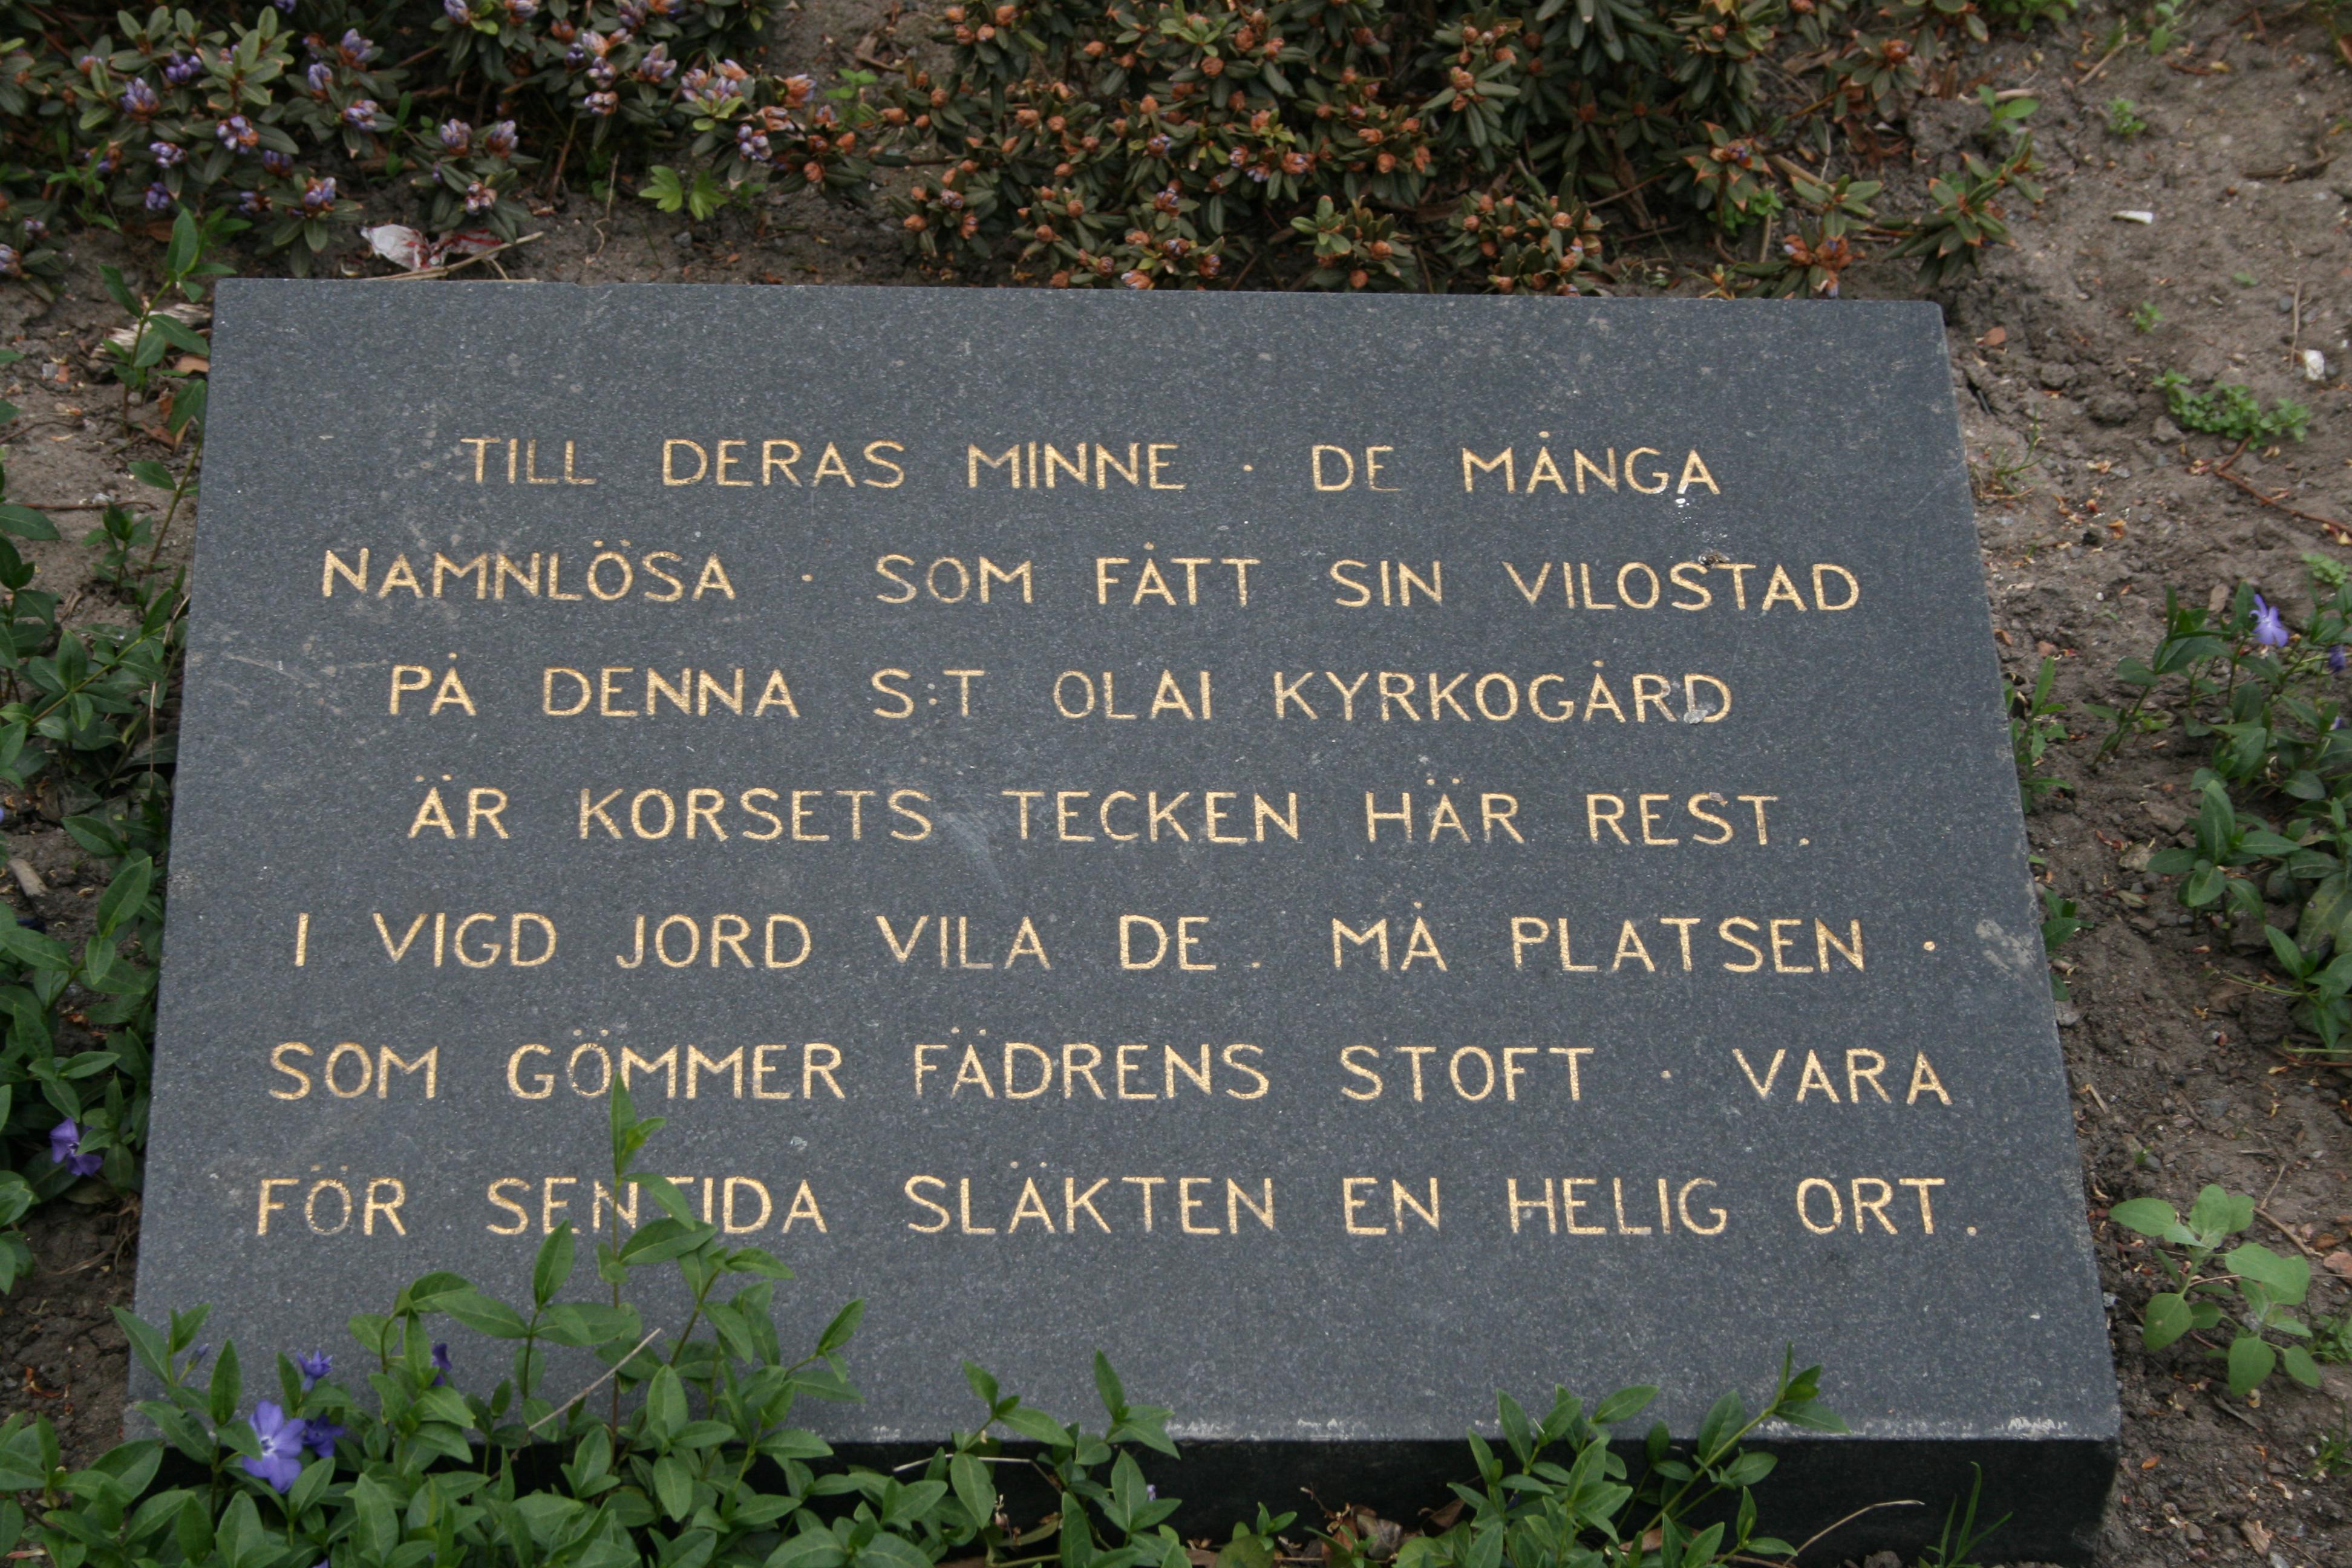 norrköpings s: t olai dating site